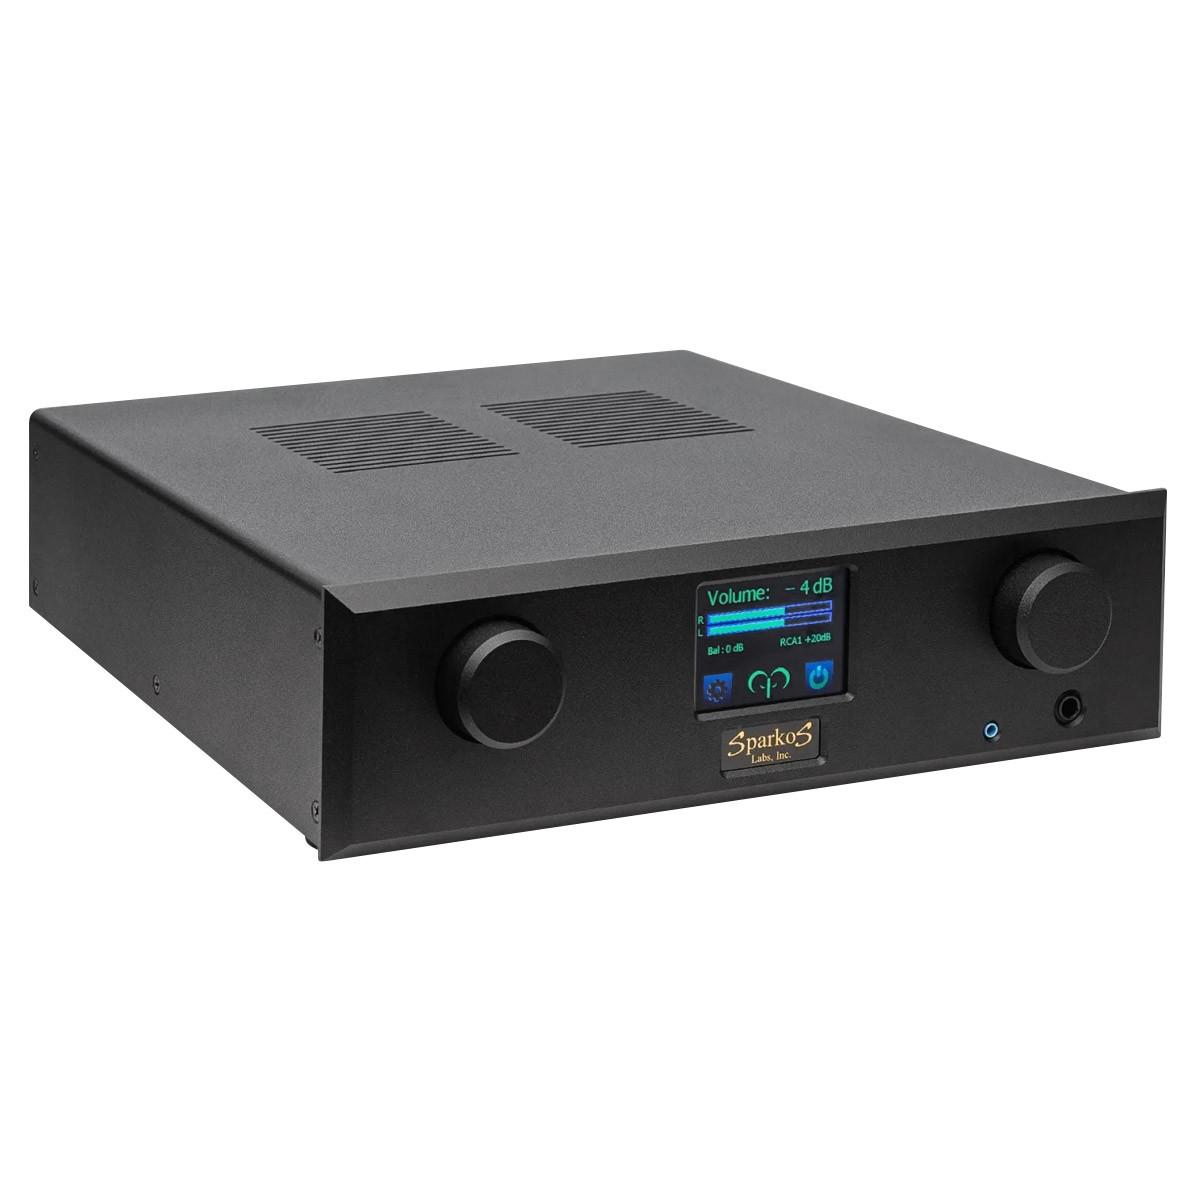 SPARKOS ARIES BASE Discrete Headphone Amplifier